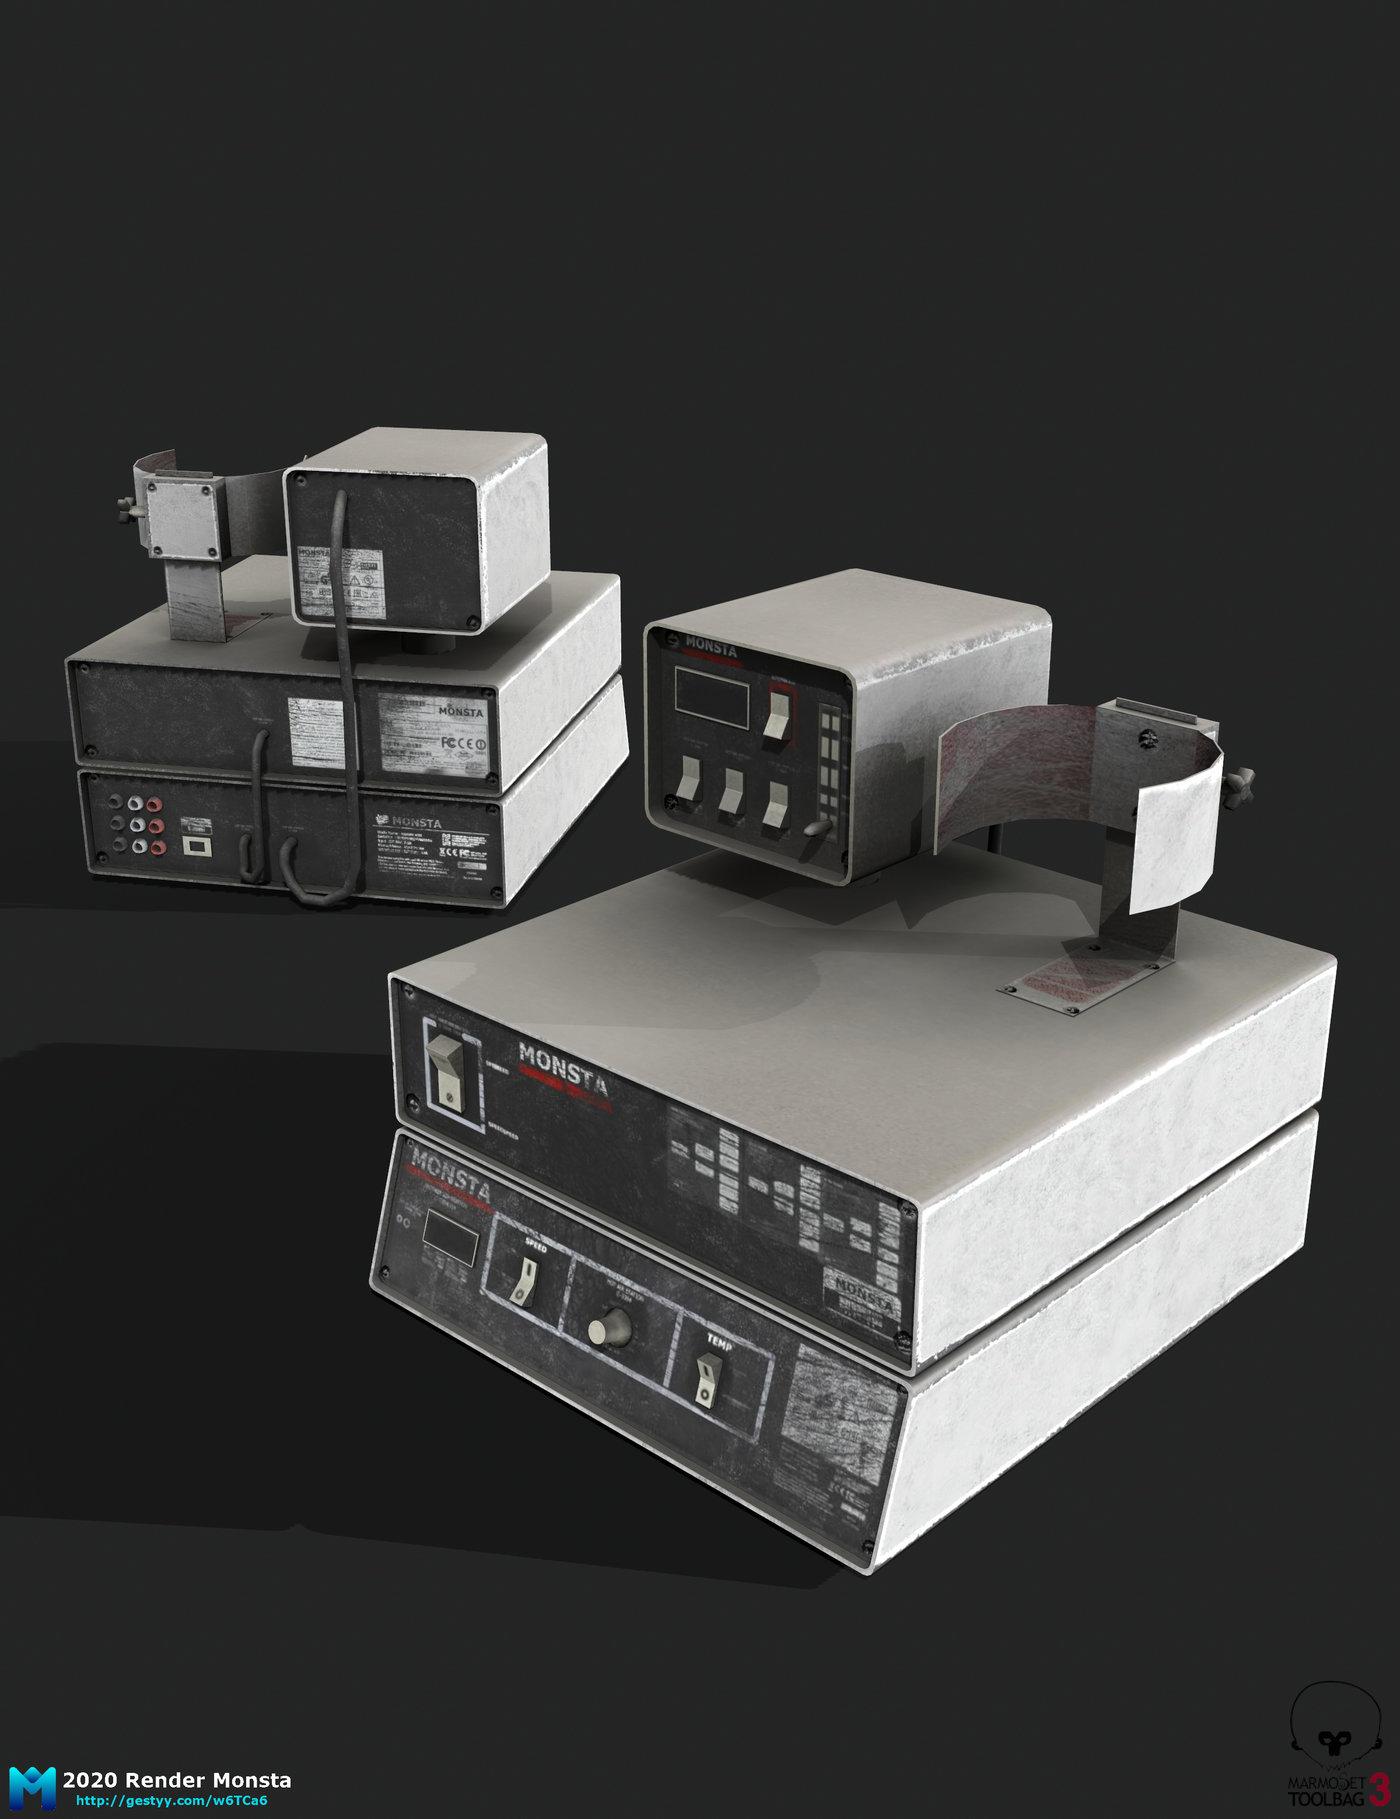 old pbr lab equipment